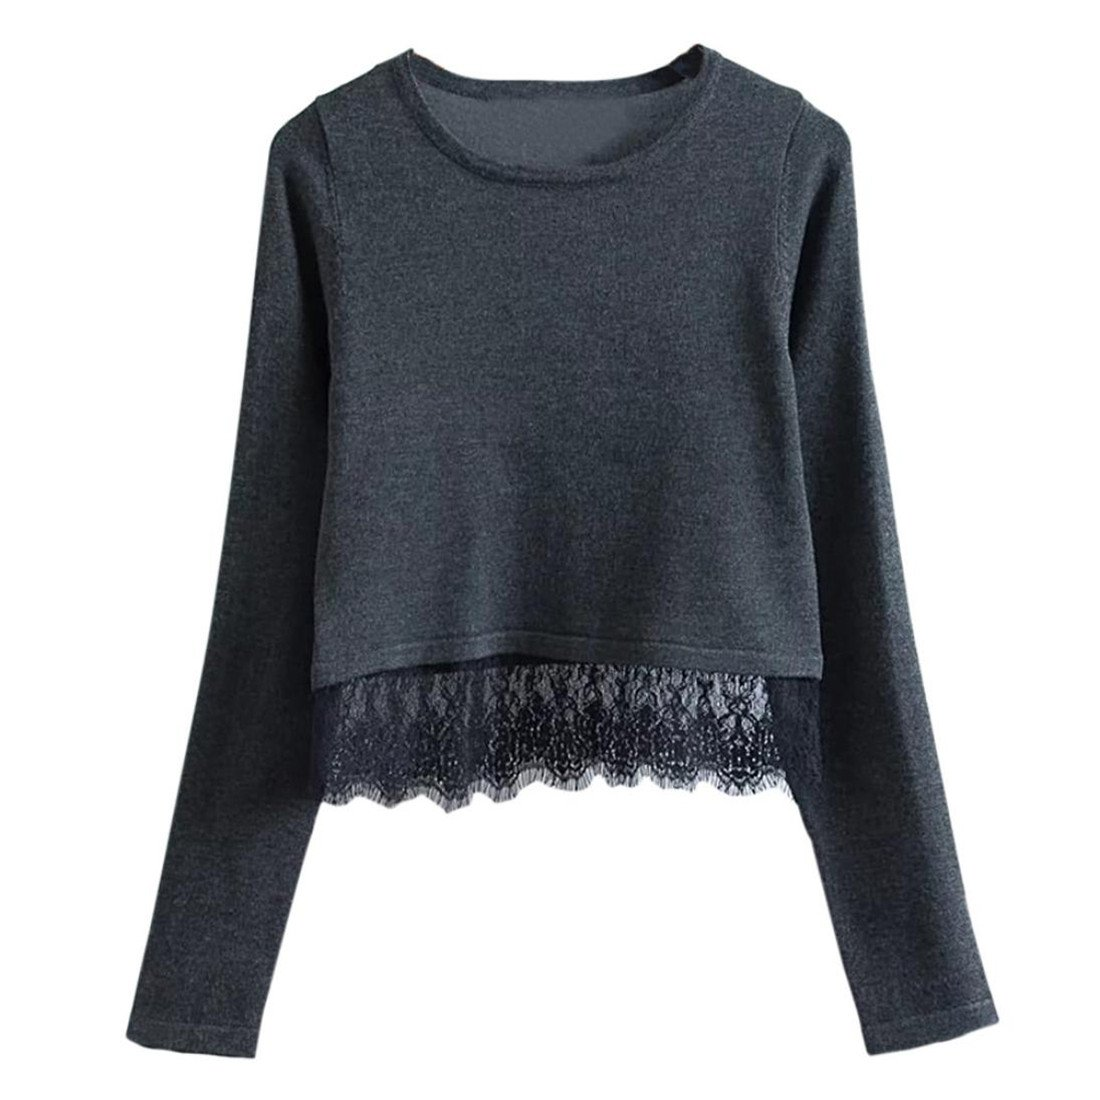 Pullover Damen Btruely Spitze Sweatshirt Langarm Sweater Tops Shirt (L, Schwarz)